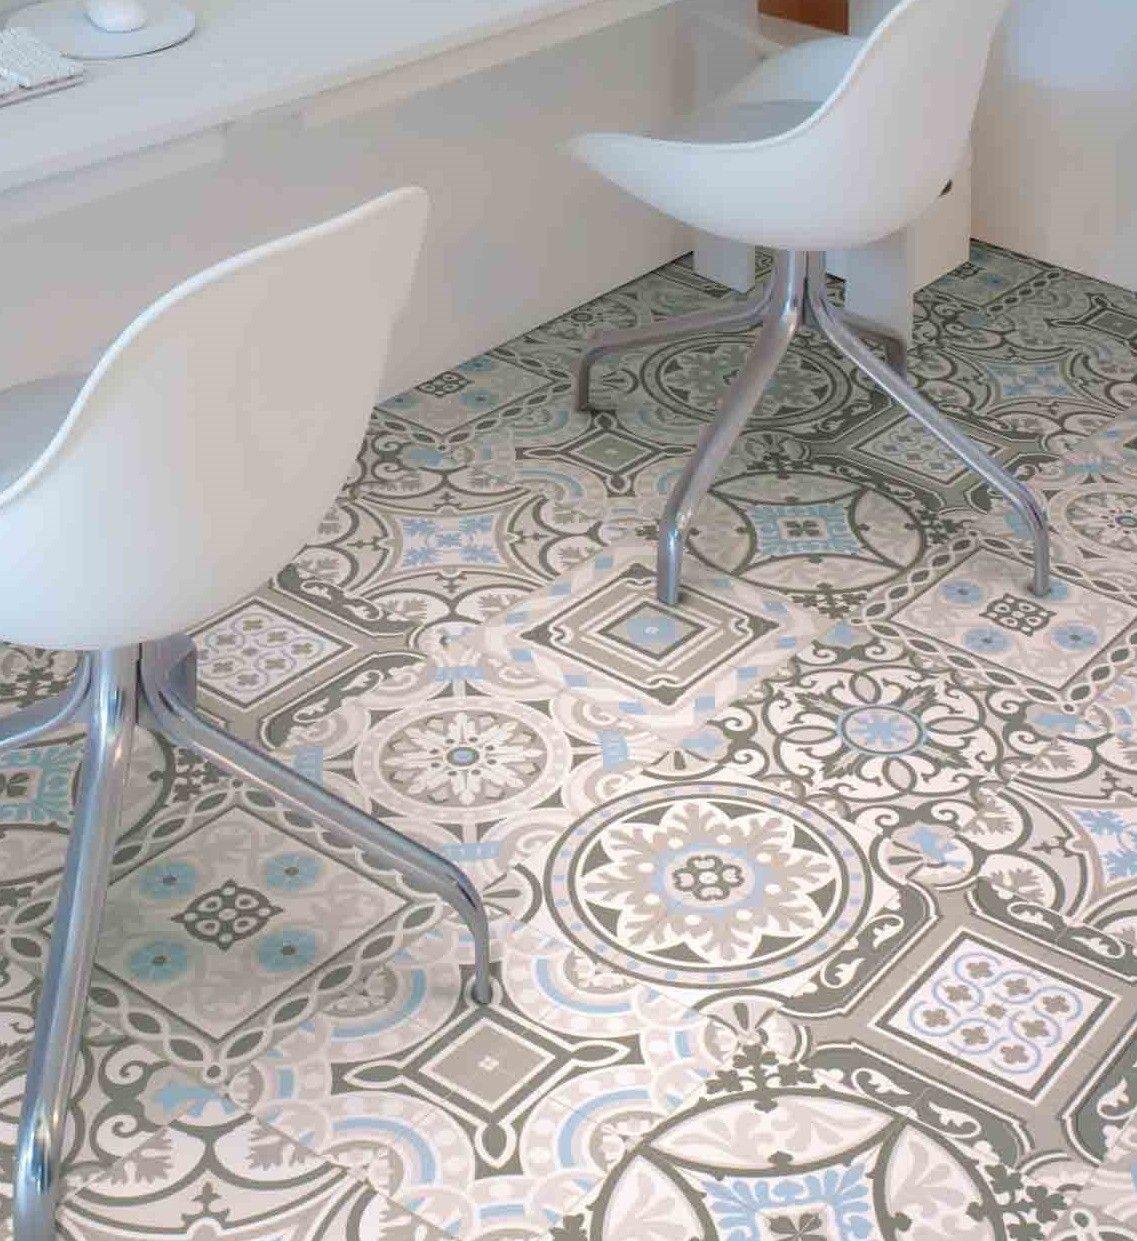 Bathroom moroccan style - Morroco Safi 04 Cushioned Sheet Vinyl Flooring Moroccan Style Loose Laid